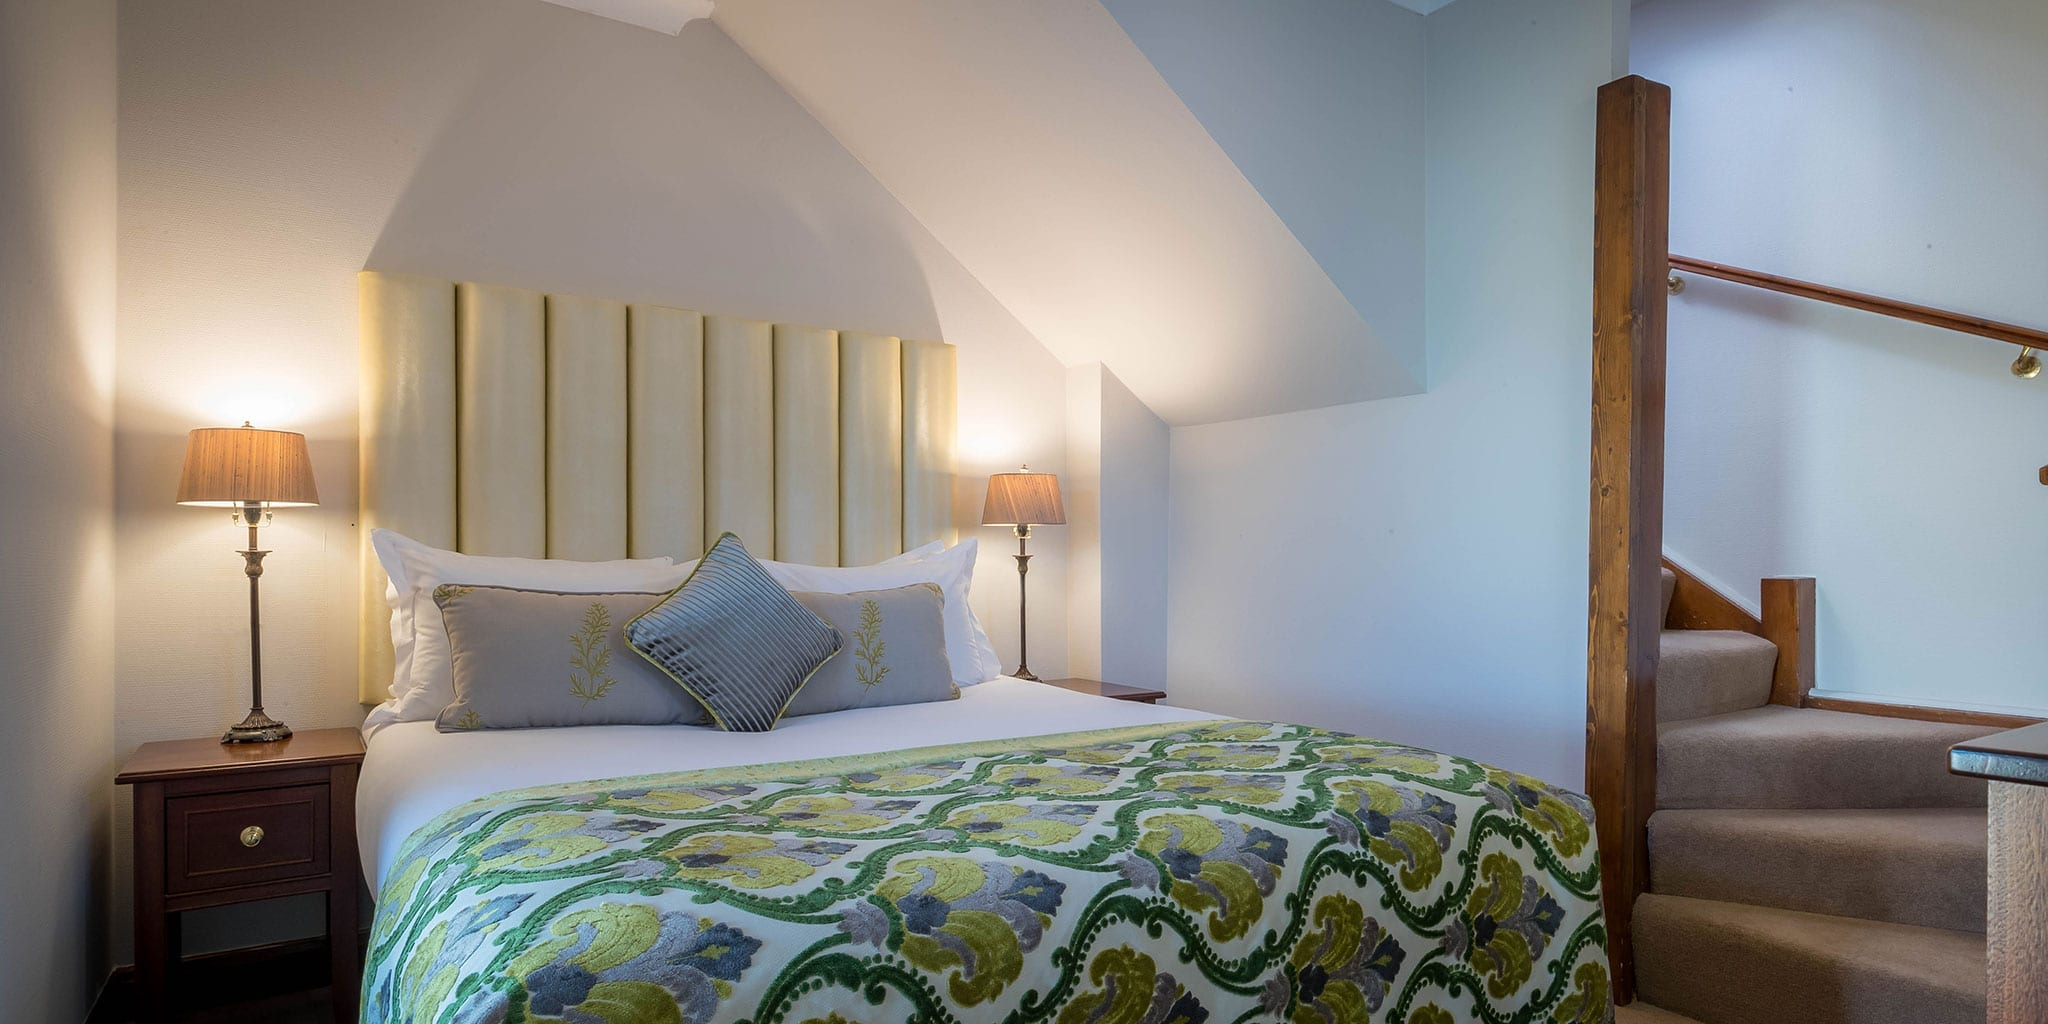 Tower-Bedroom-Clayton-Ballsbridge